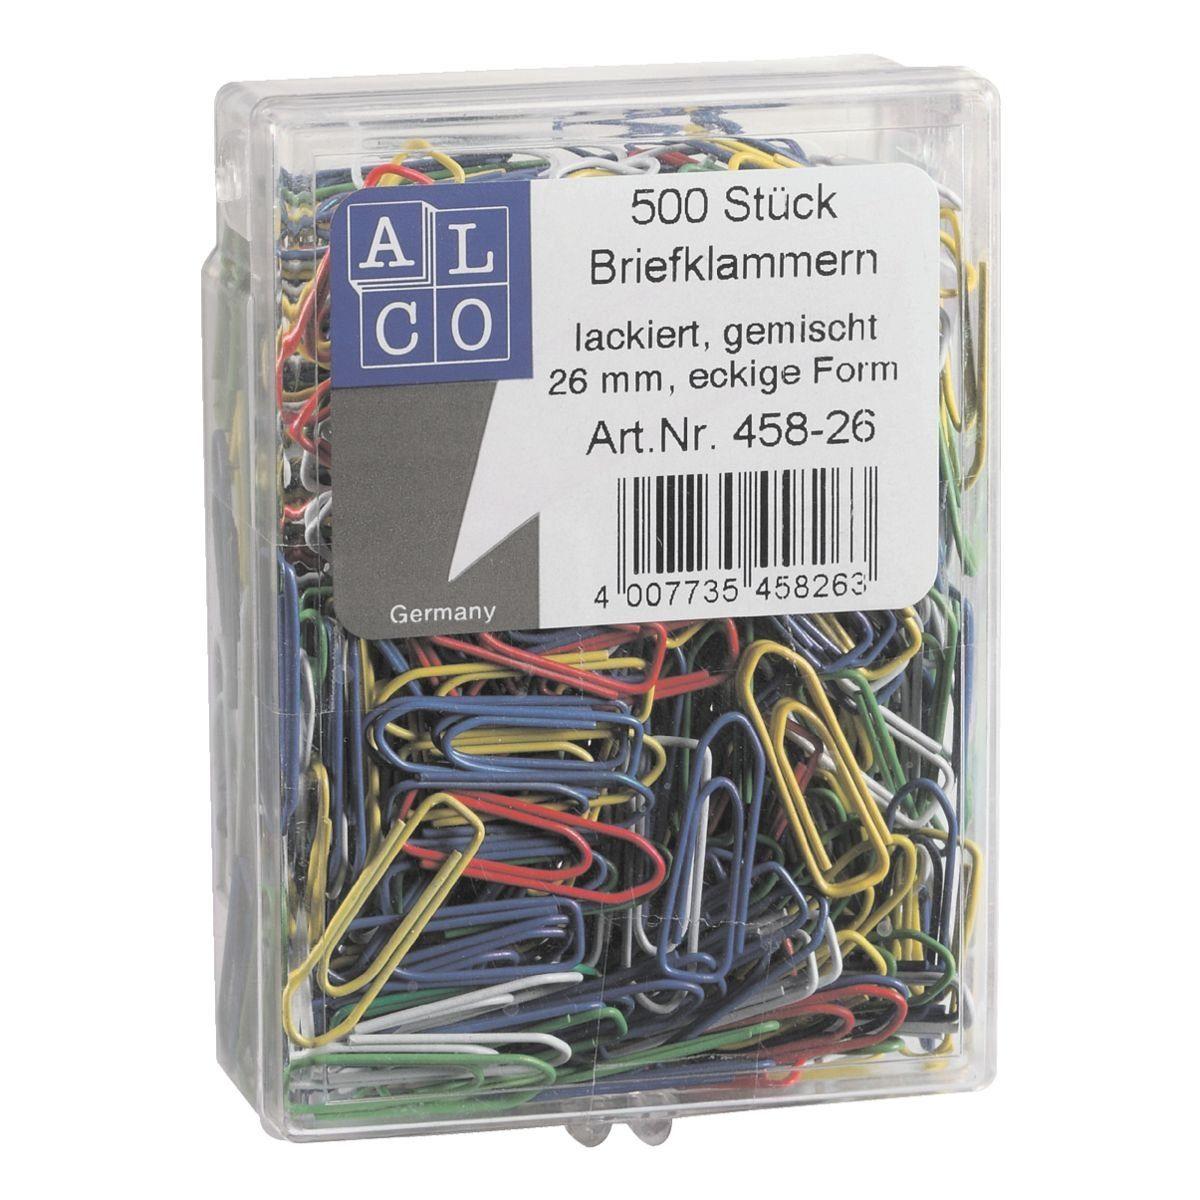 ALCO Büroklammern 26mm, mehrfarbig, 500 Stück